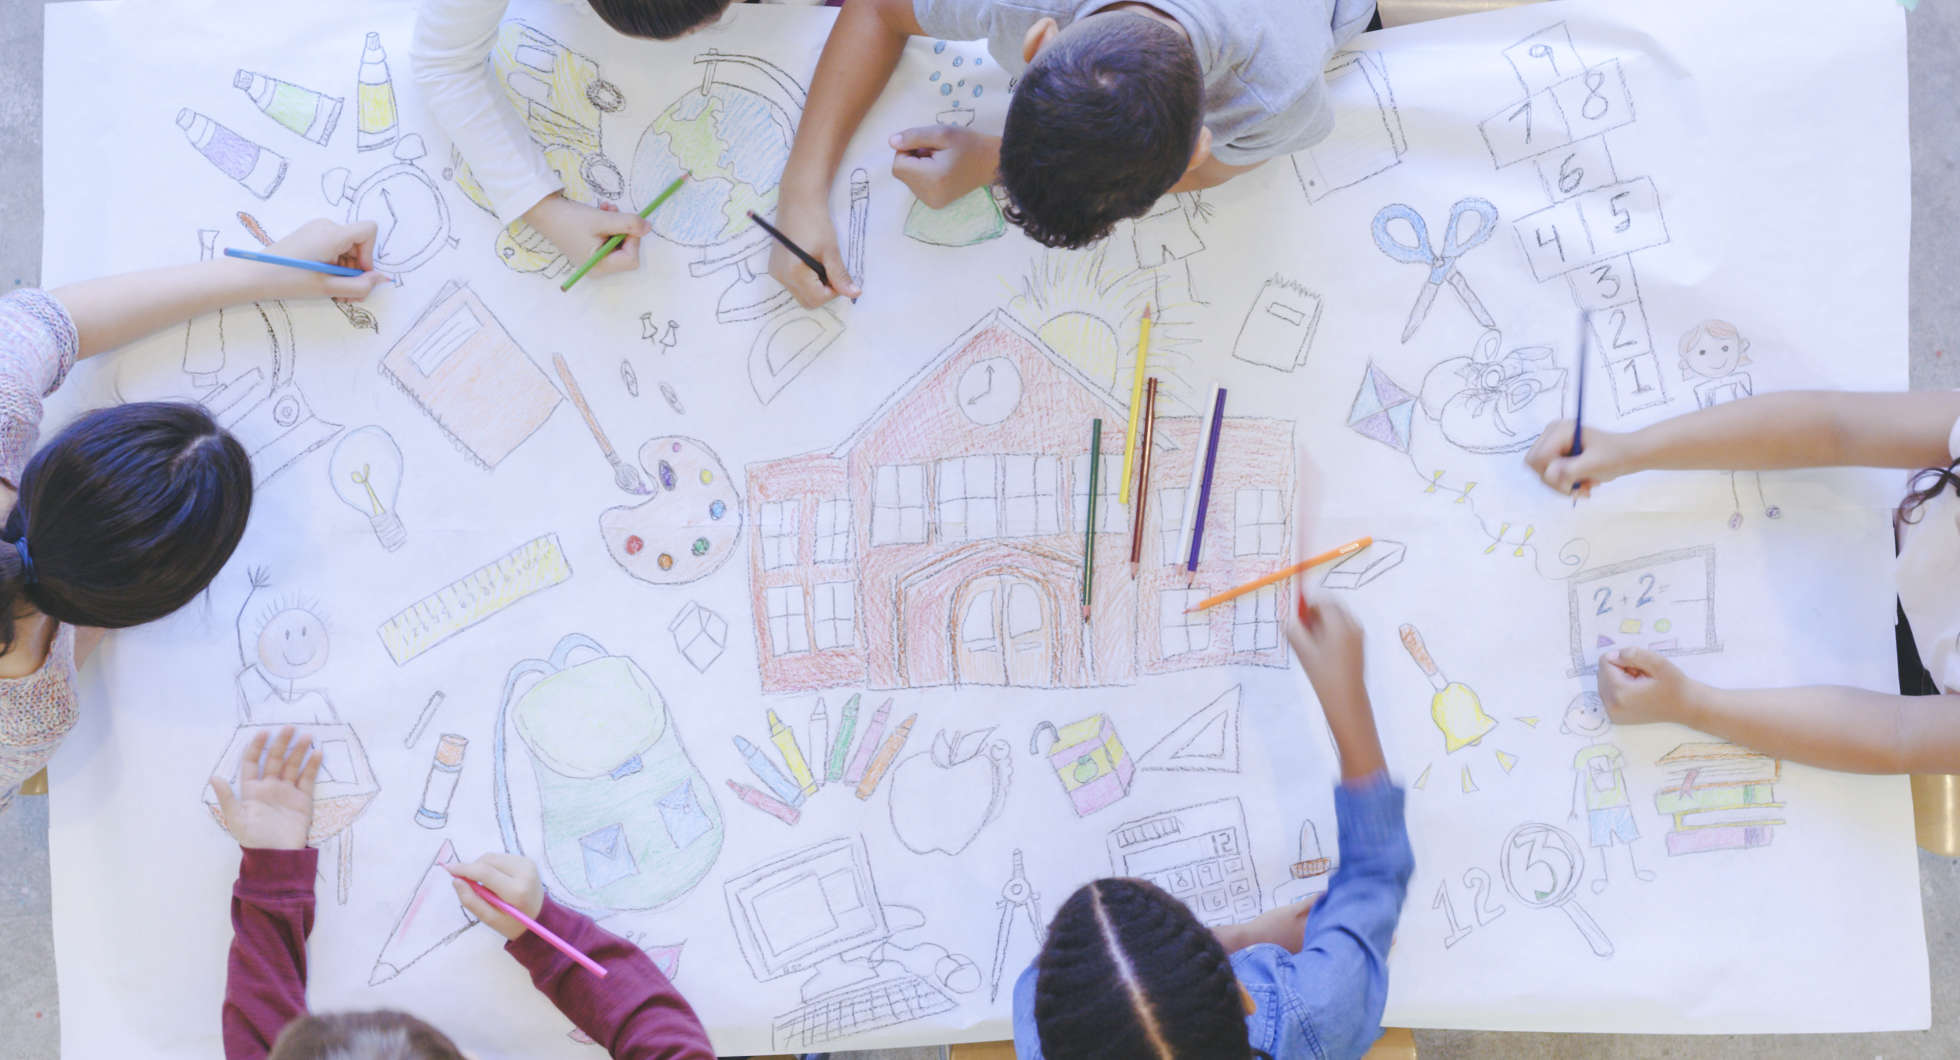 Primary school children color